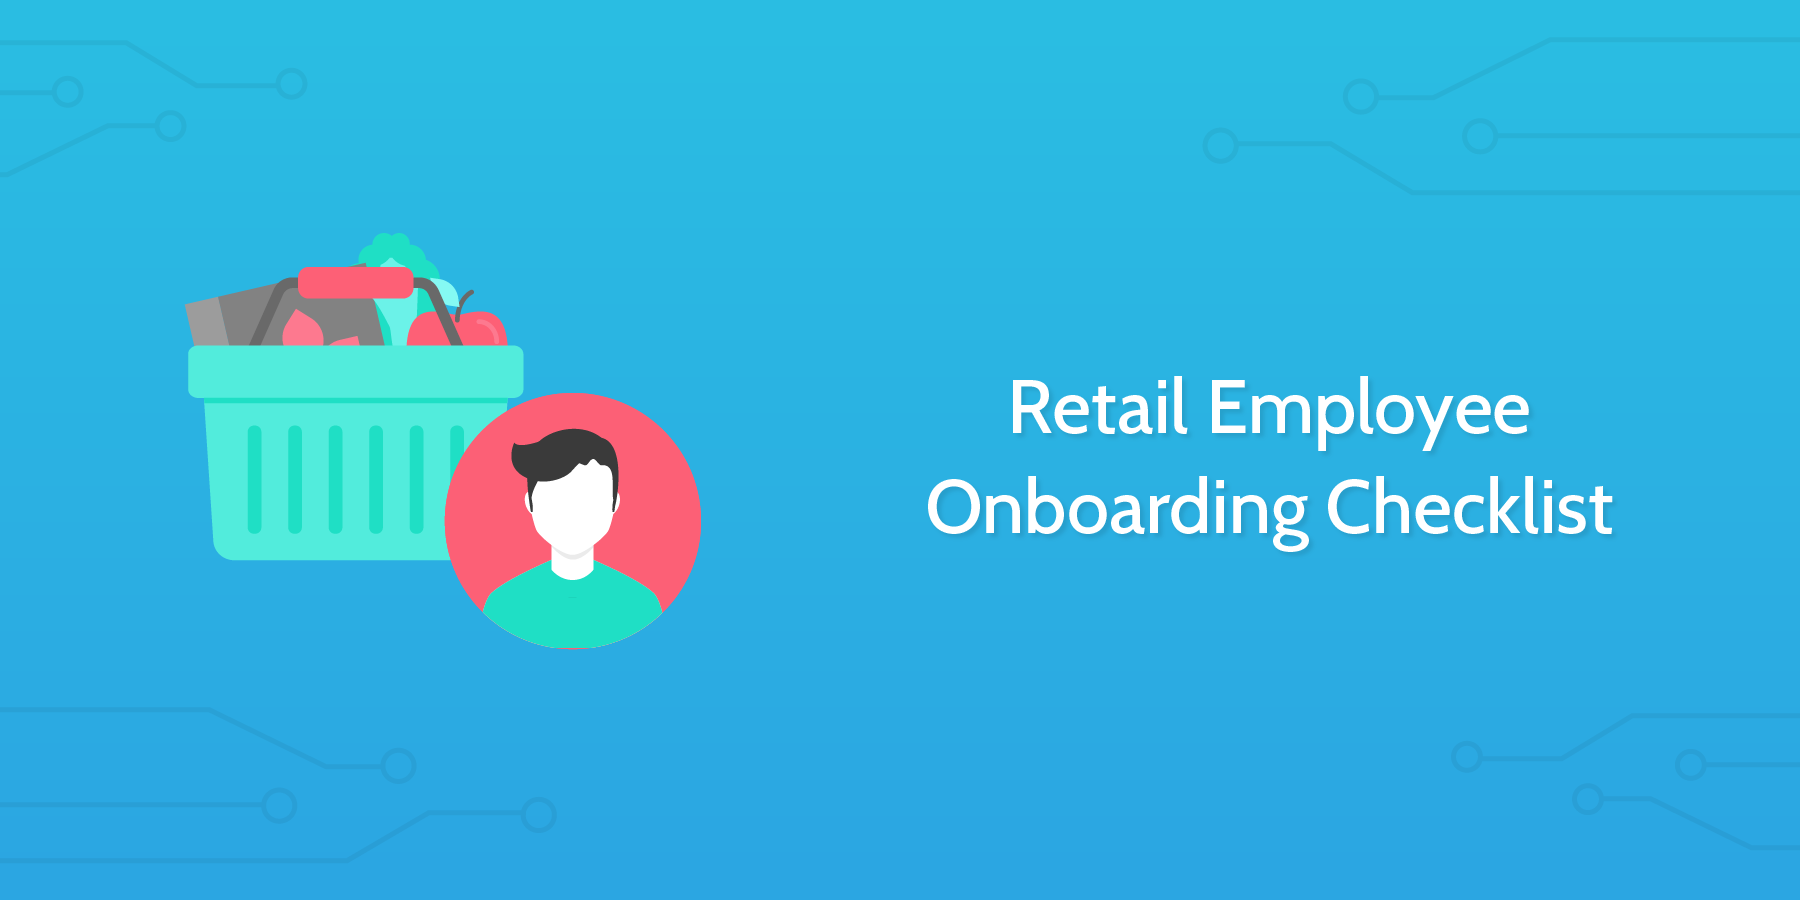 New hire checklist - Retail Employee Onboadring Checklist